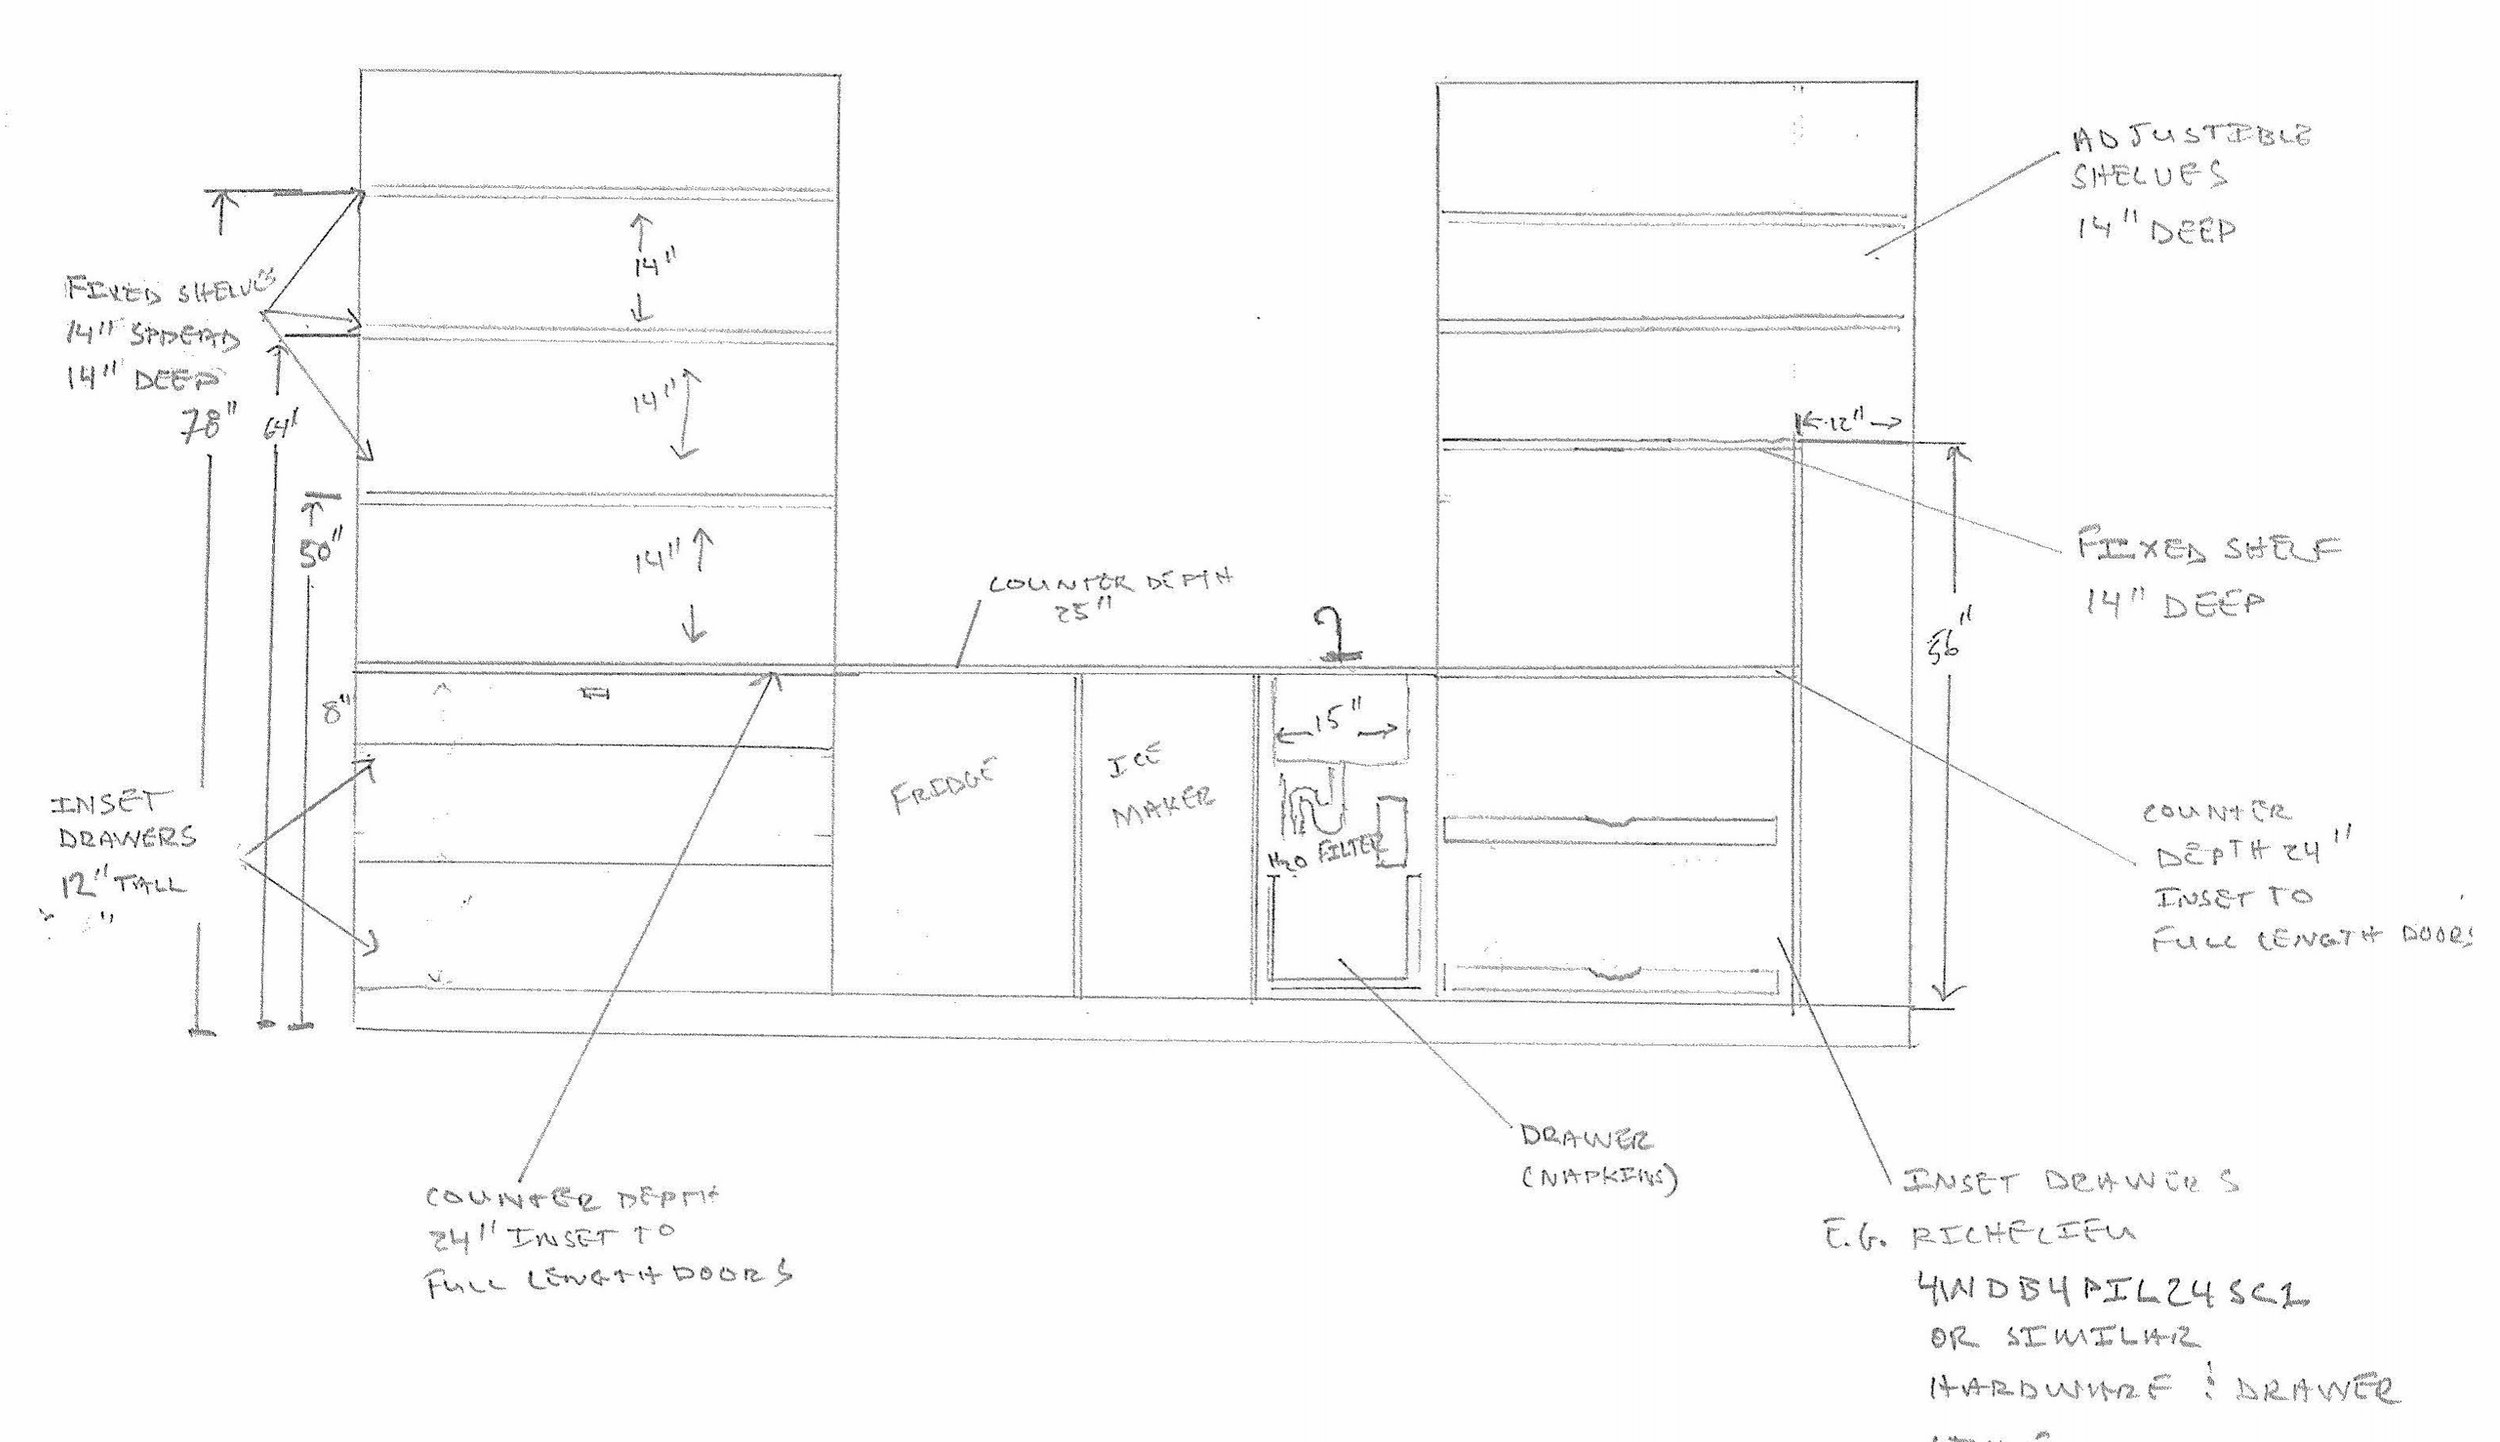 rwr kitchen drawing_Page_2.jpg